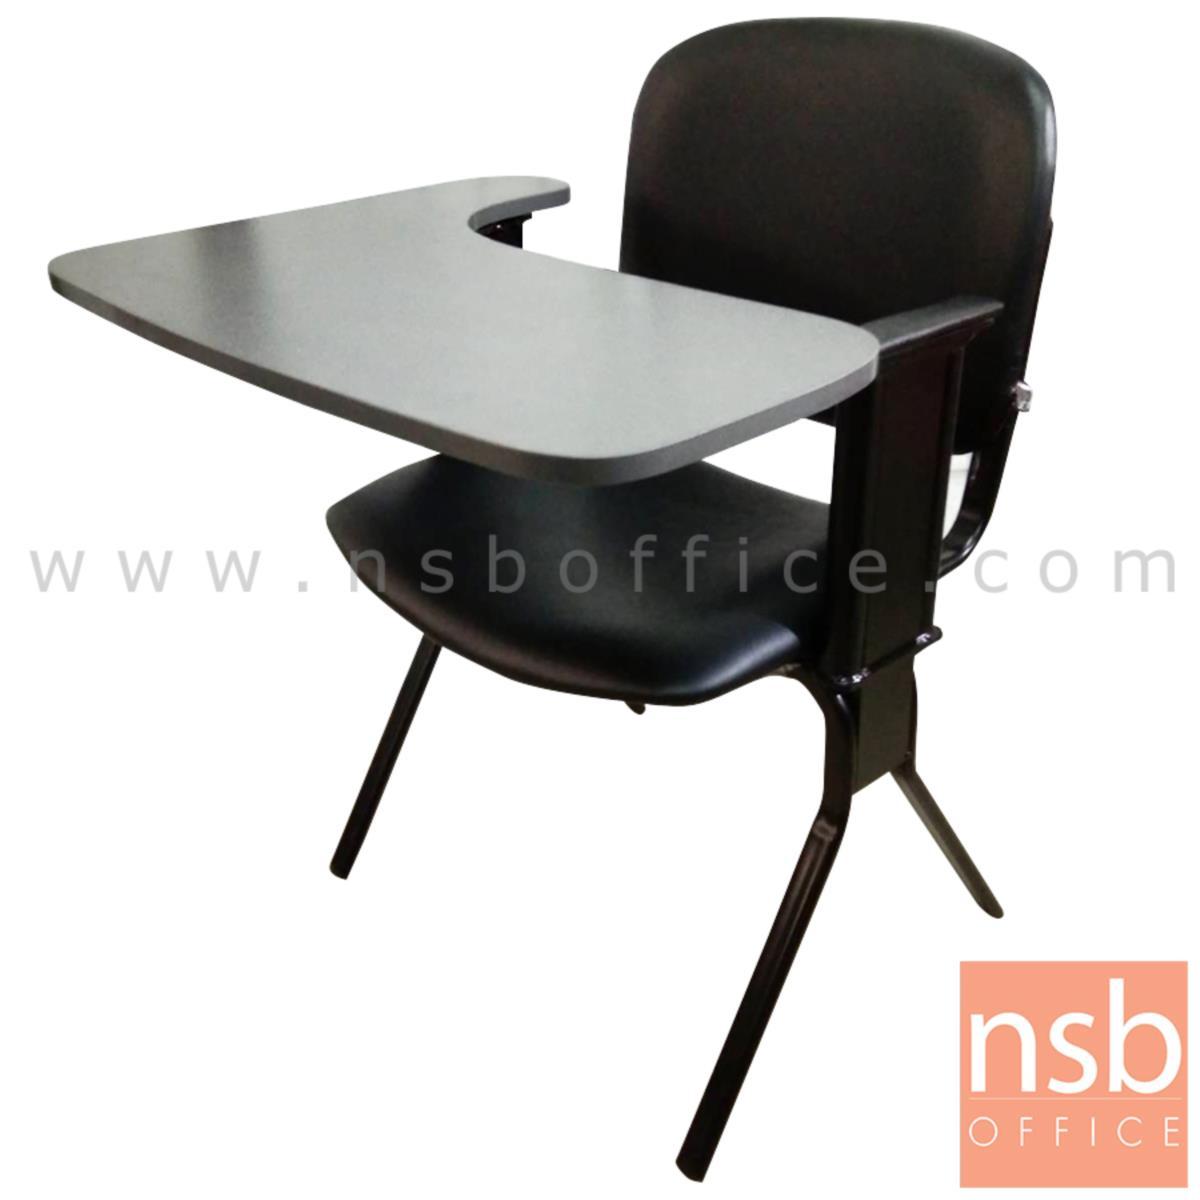 B07A090:เก้าอี้เลคเชอร์ รุ่น C-006 ขาเหล็กพ่นดำ